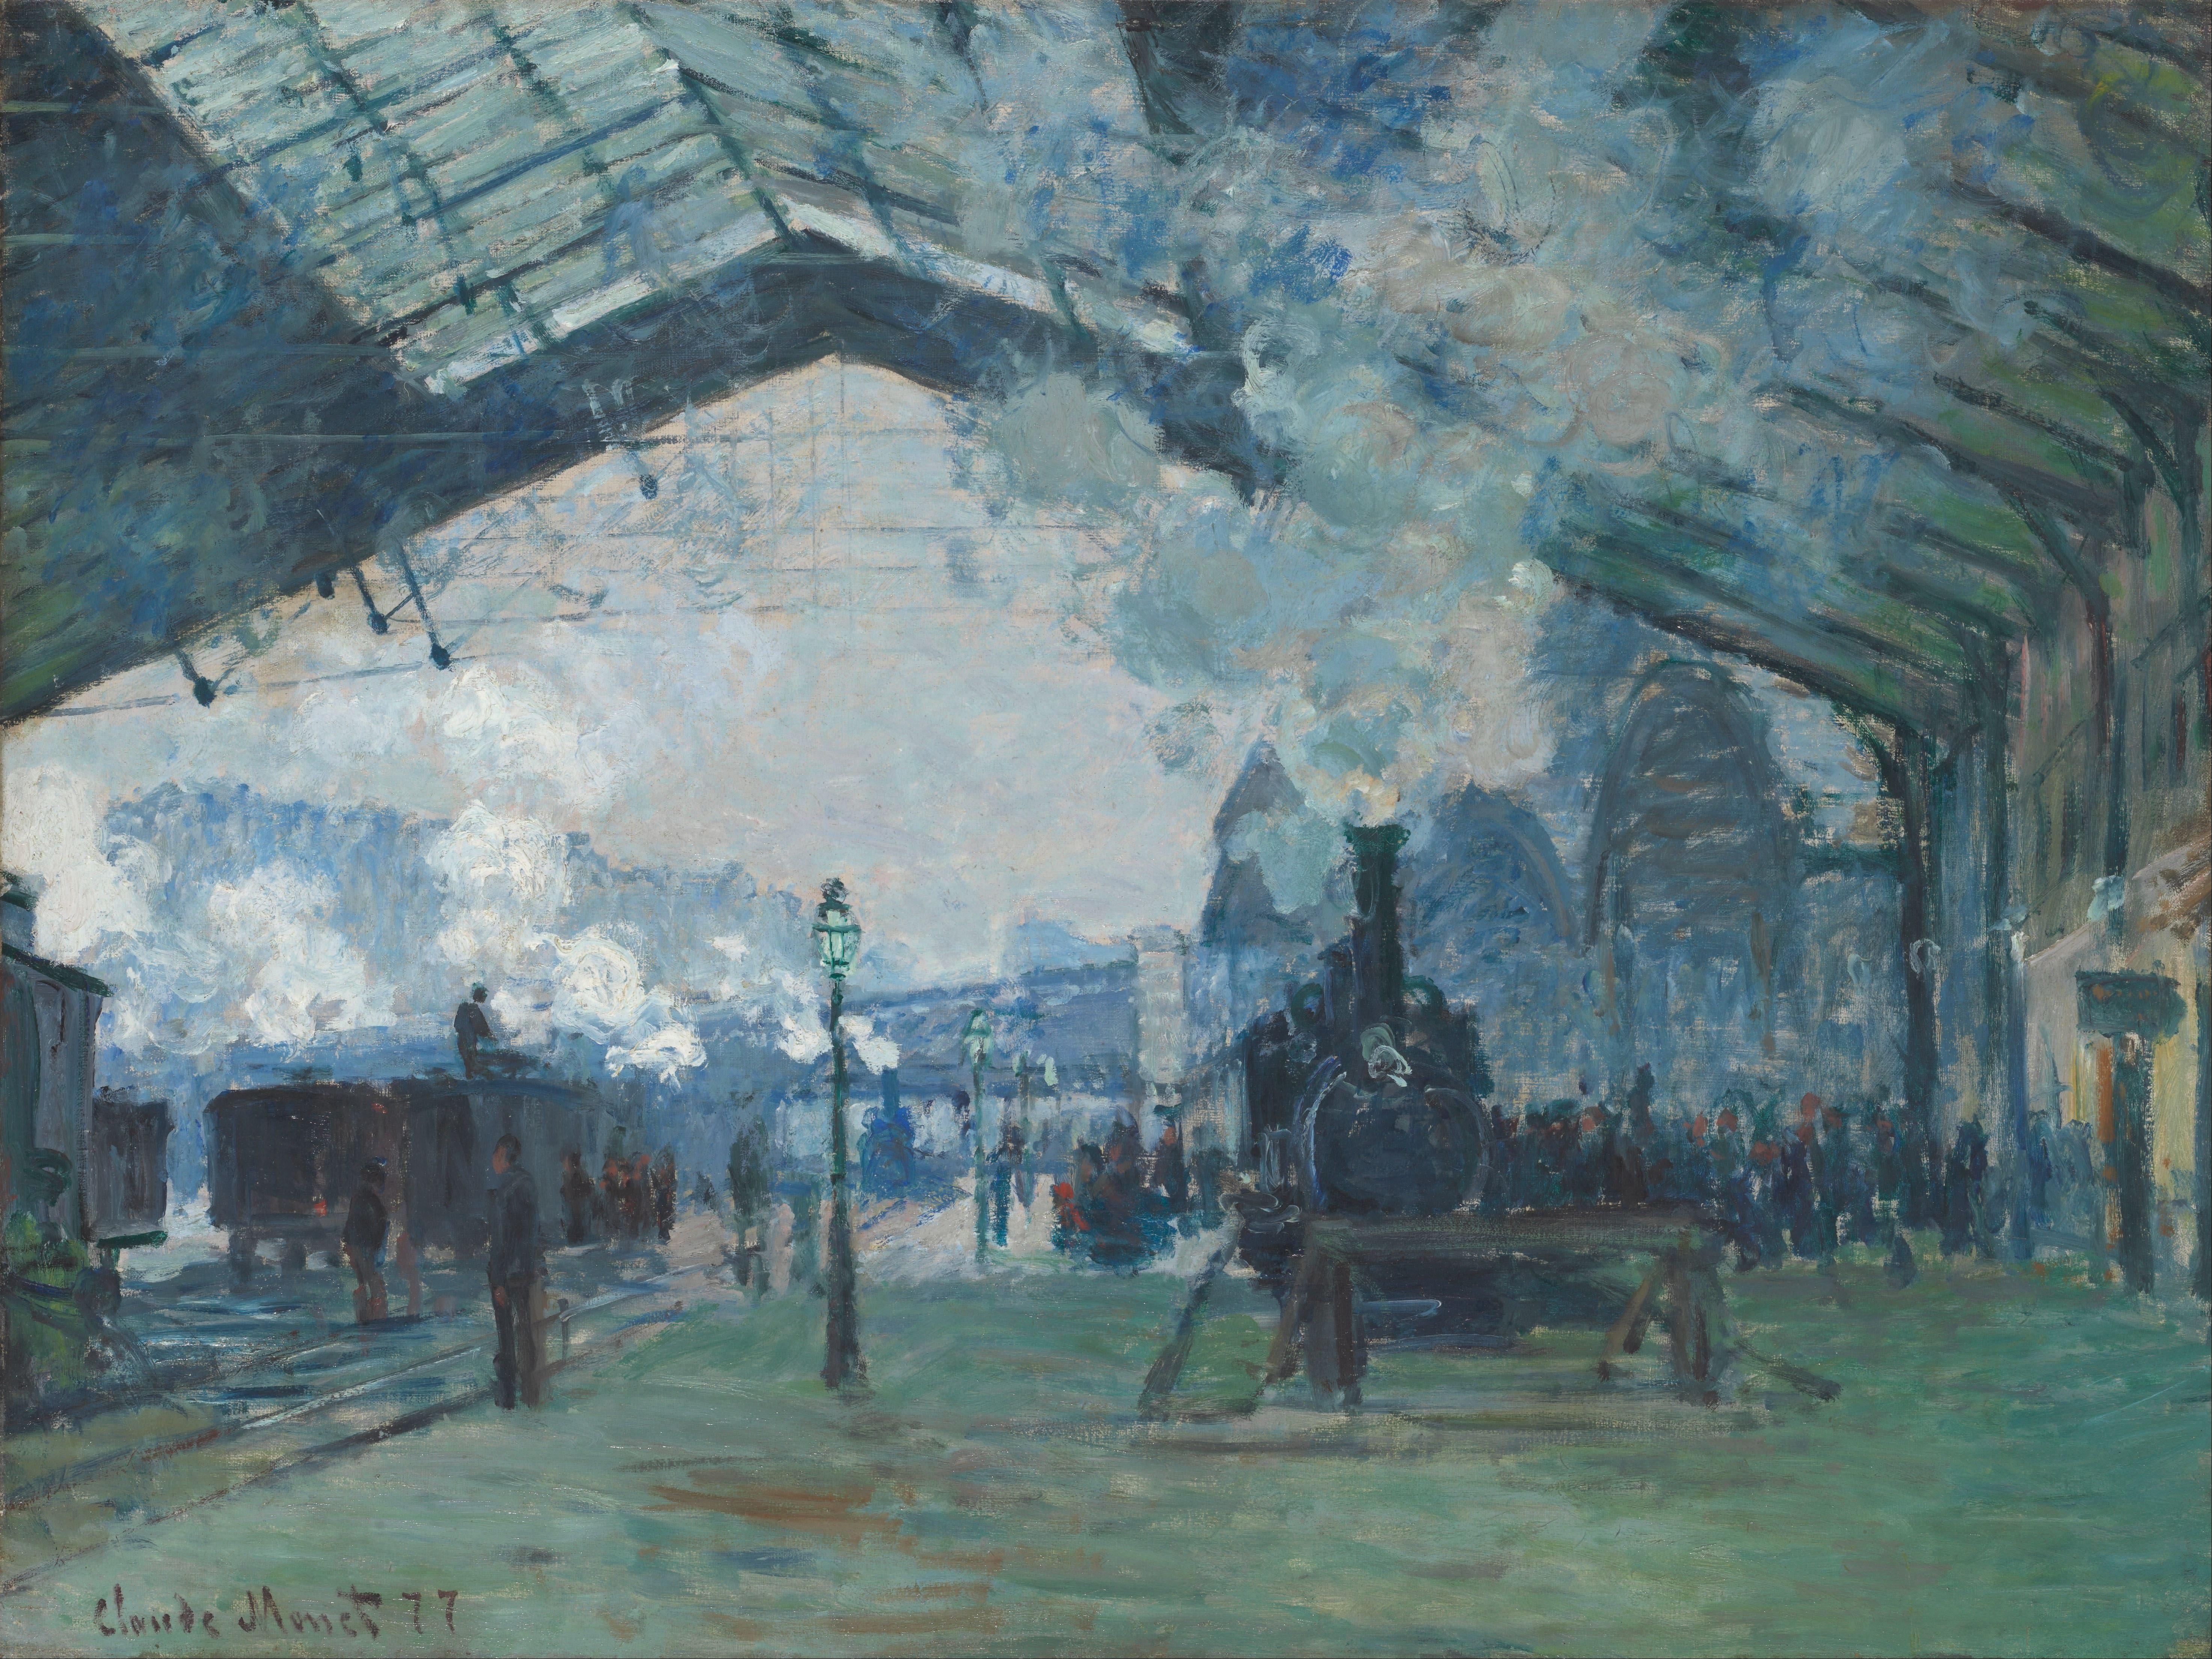 File:Claude Monet - Arrival of the Normandy Train, Gare